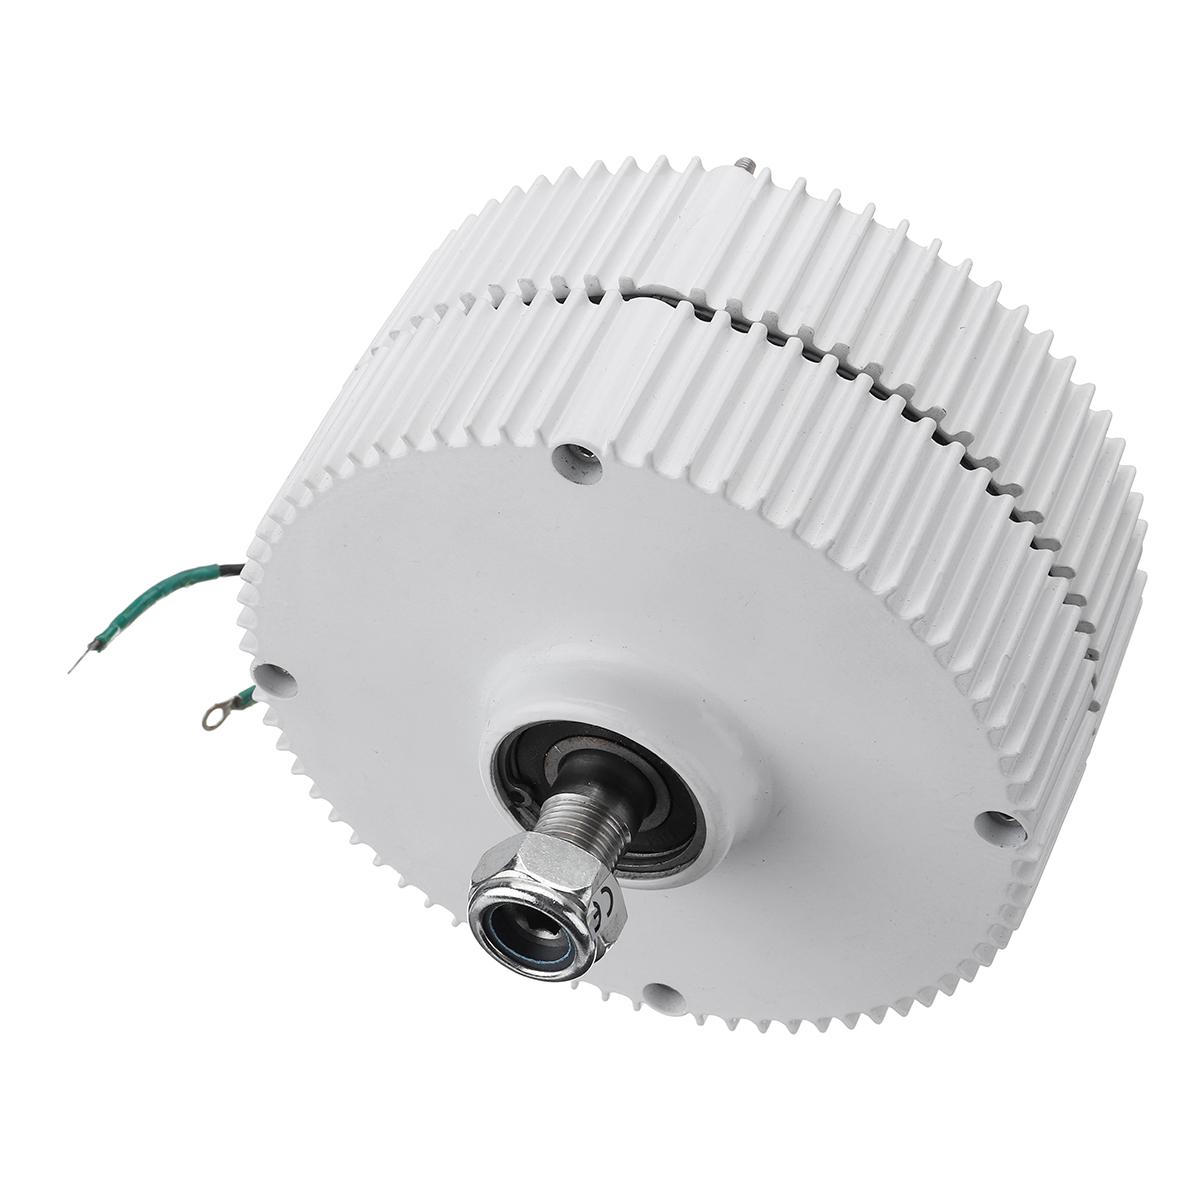 DC 12V 24V 400W Permanent Magnet Generator Wind Turbine Windkraftanlage Motor